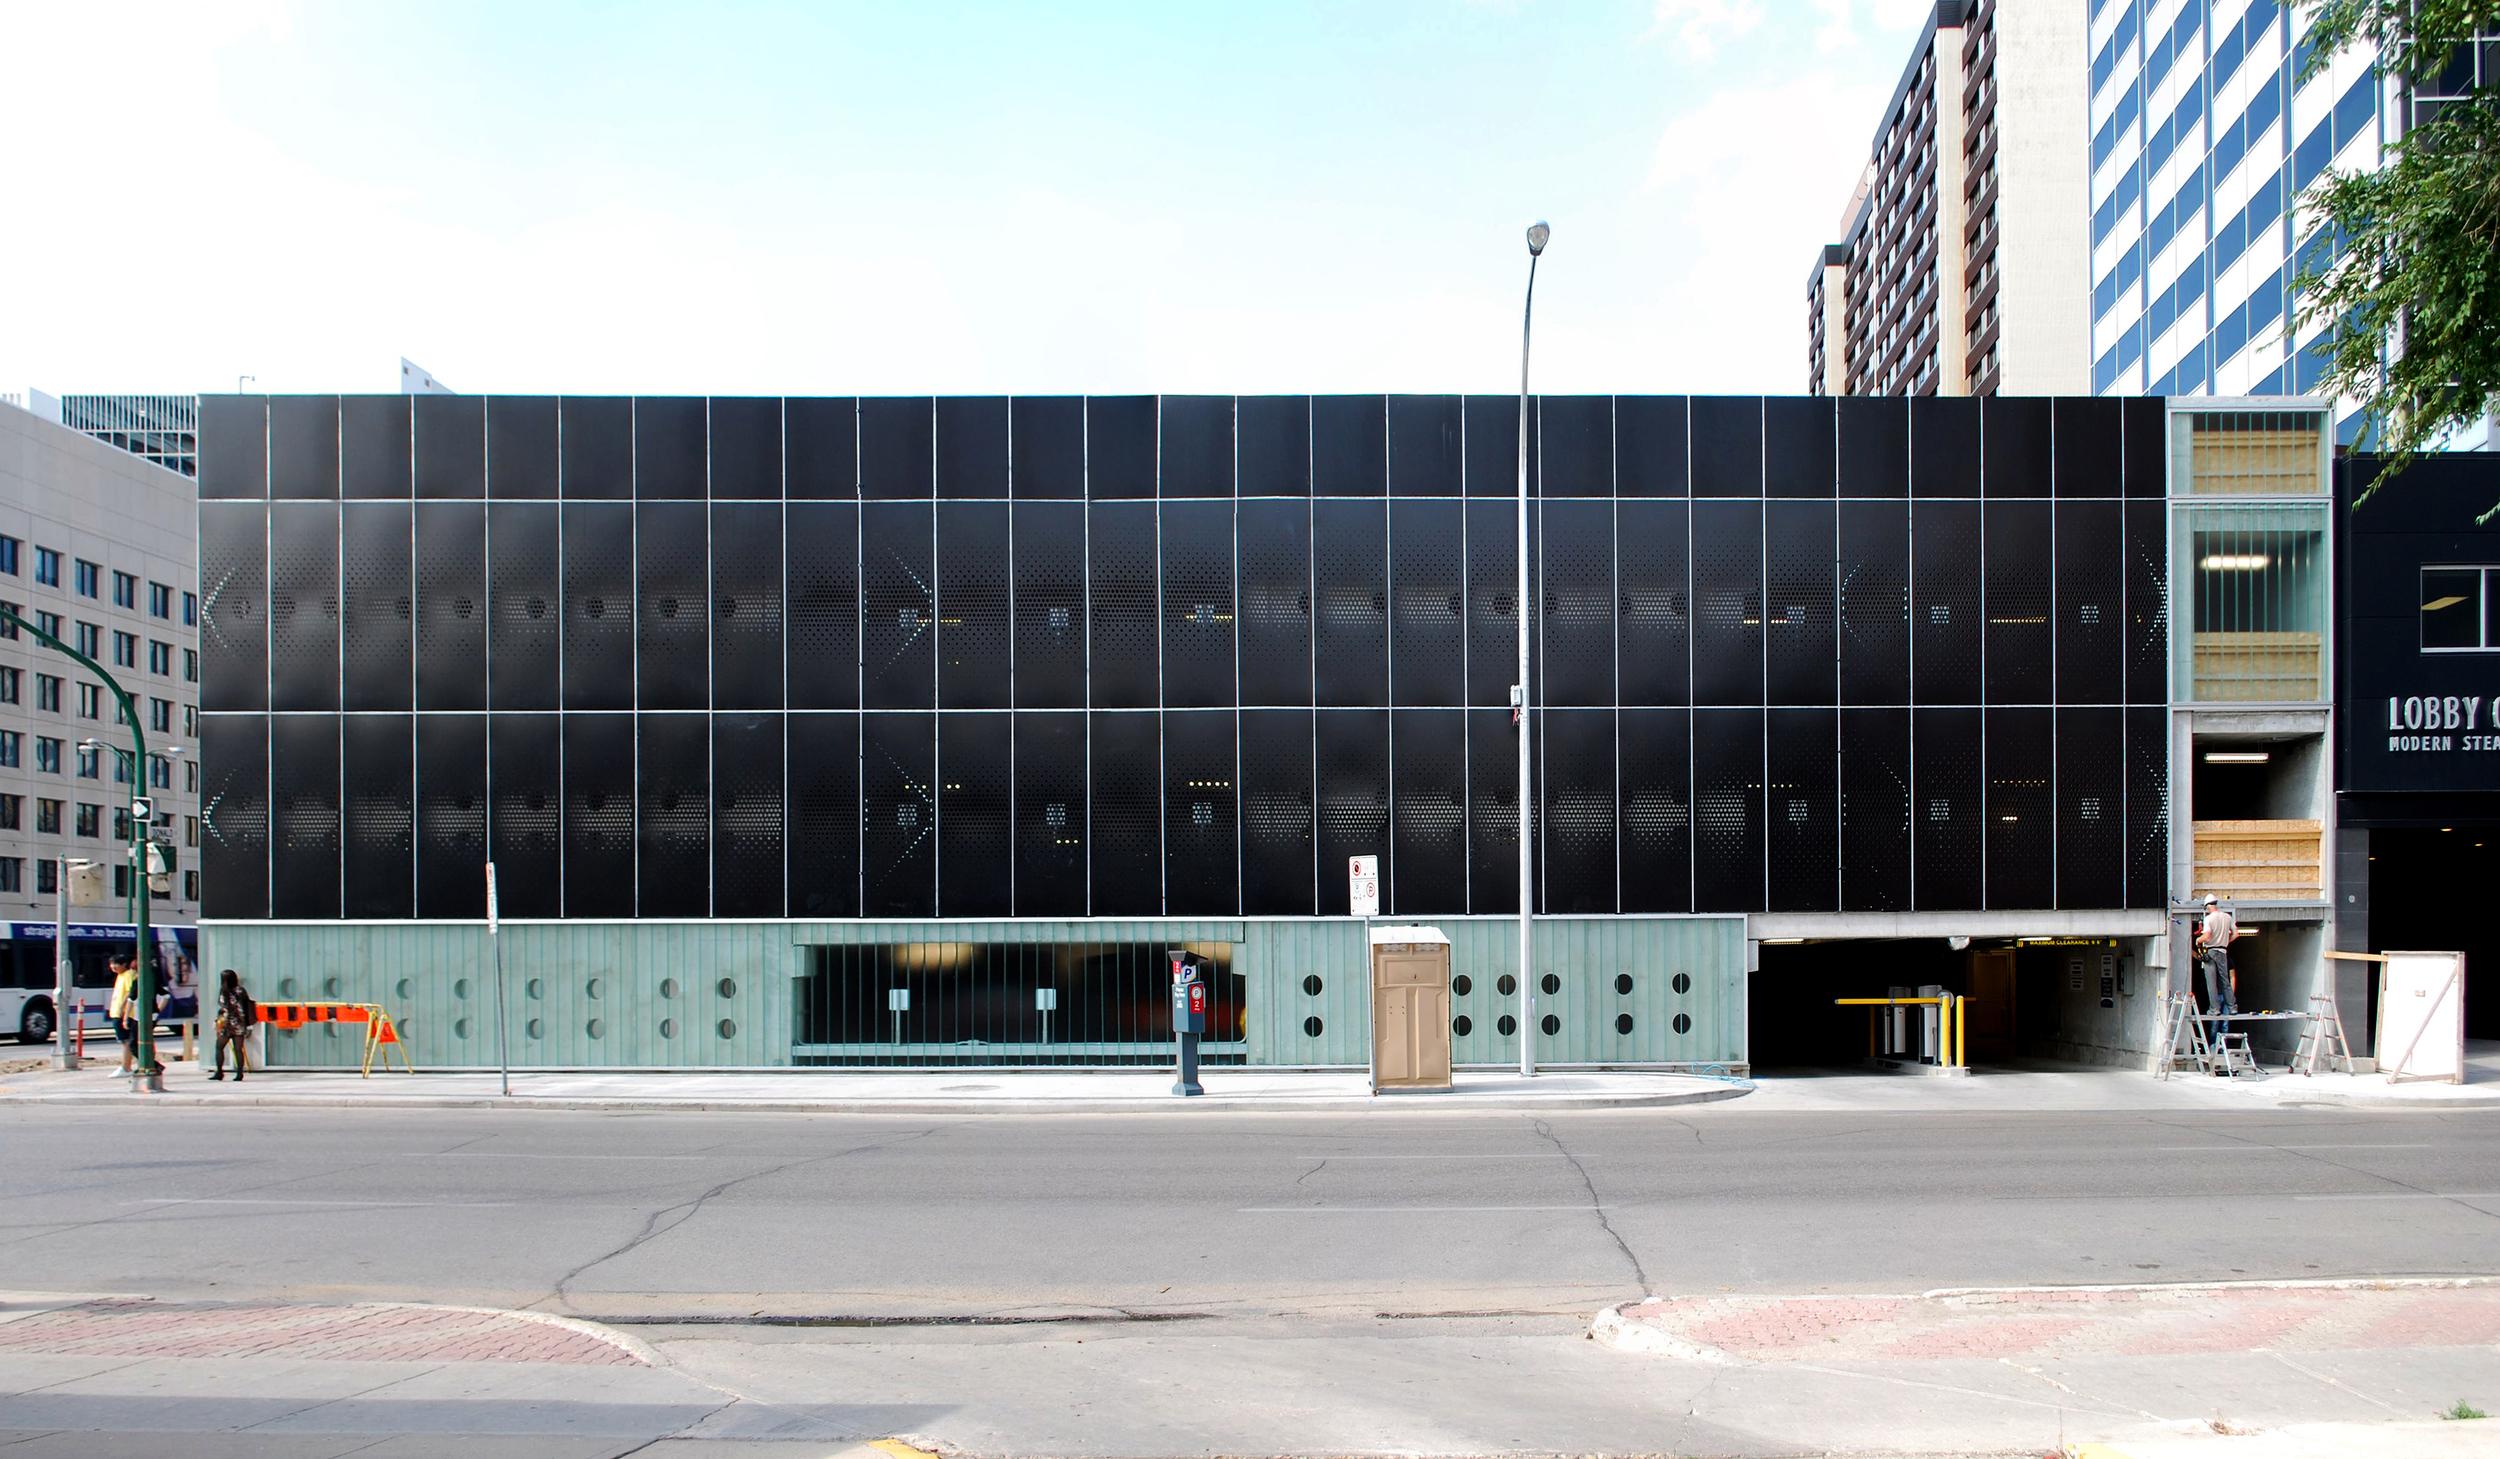 3_york_york facade.jpg